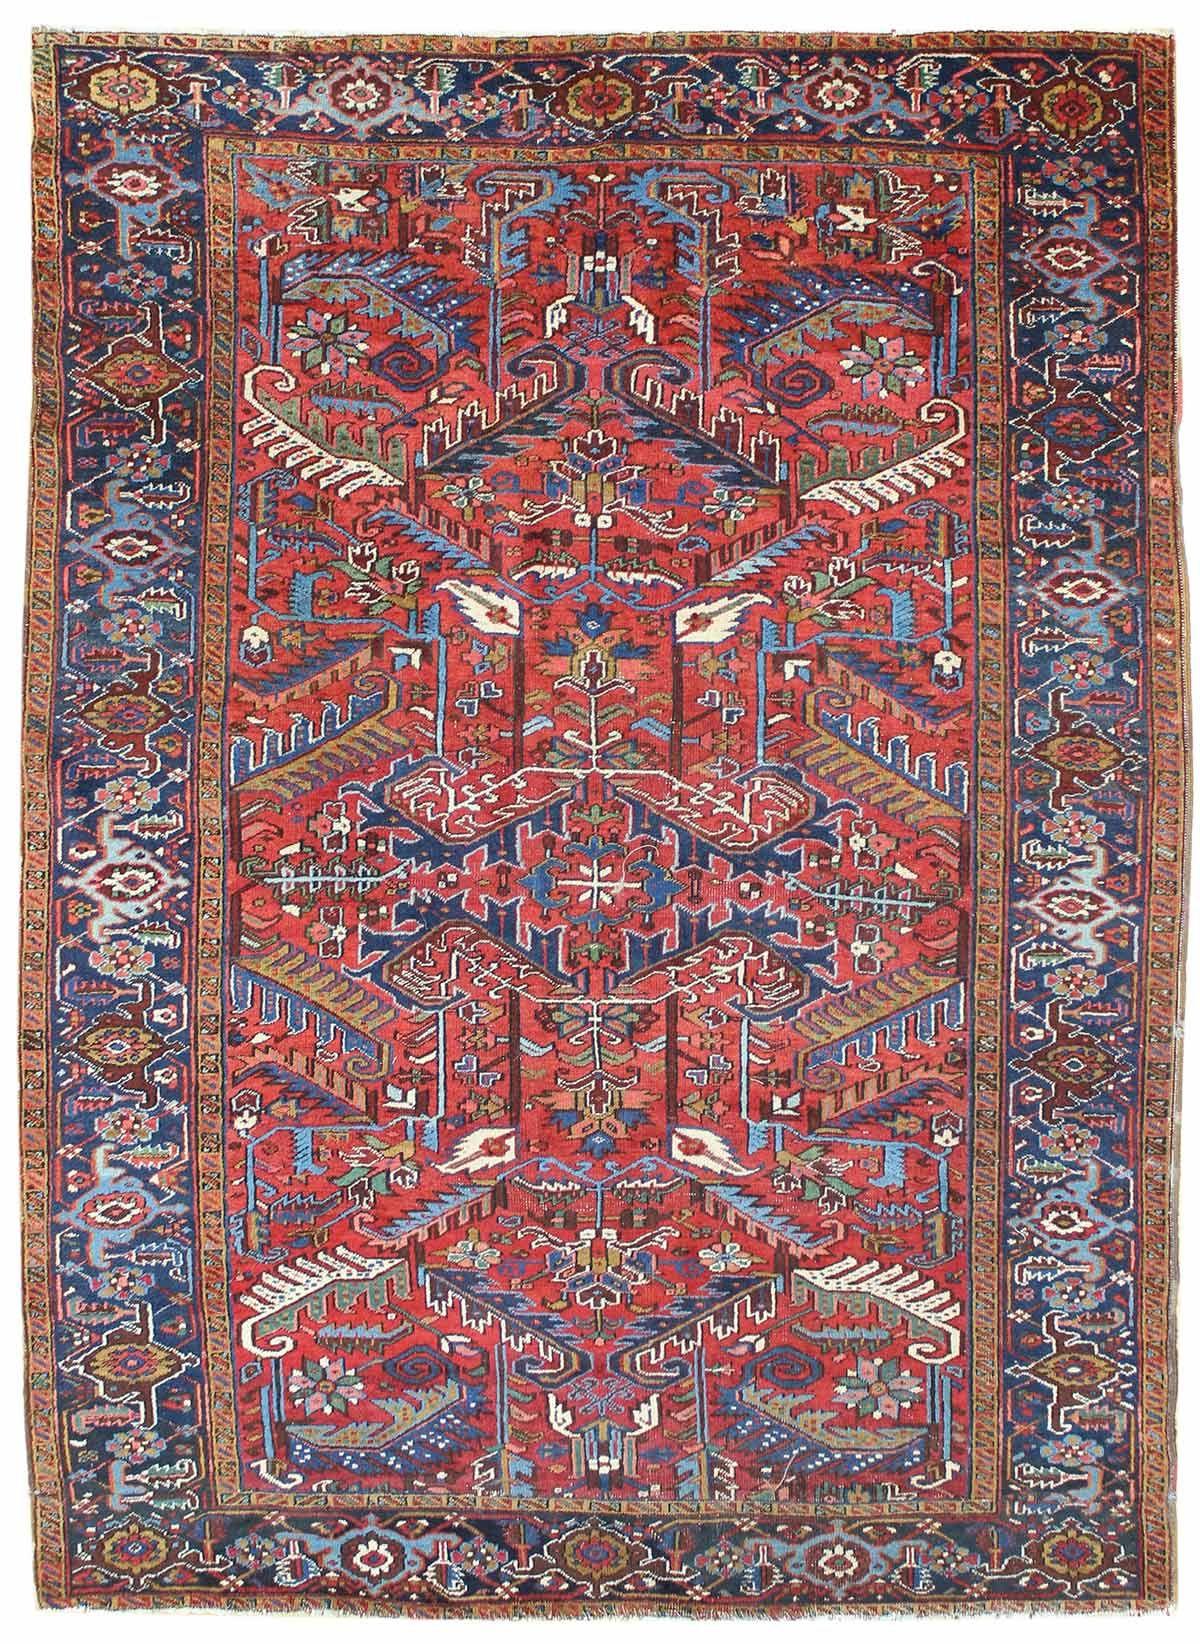 Antique Heriz Amp Serapi Rugs Gallery Antique Heriz Rug